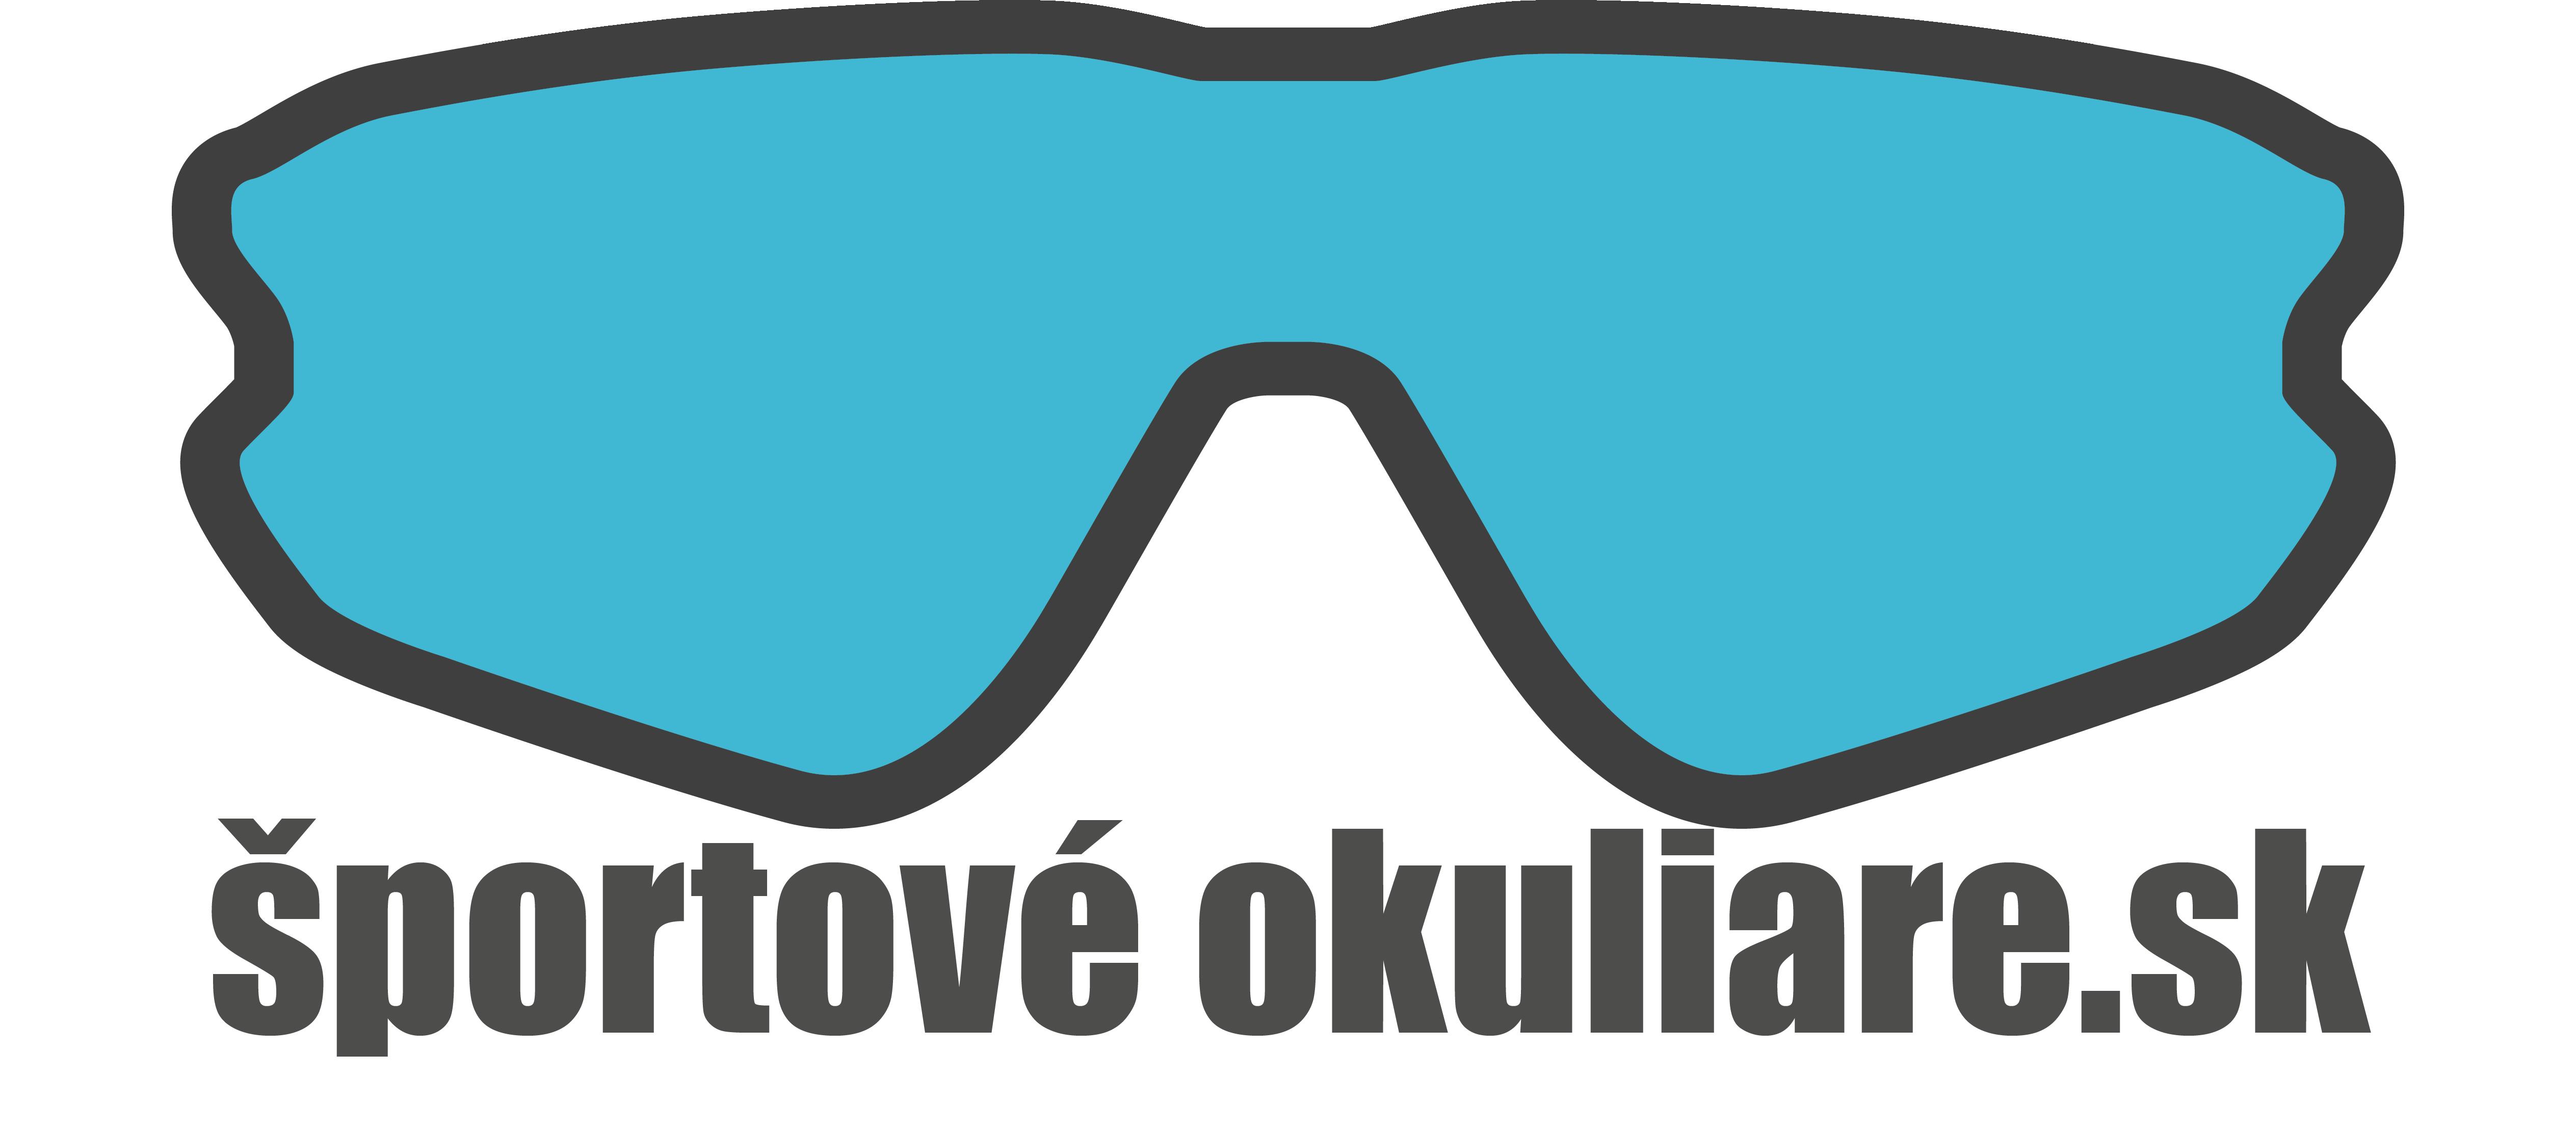 Športové okuliare.sk